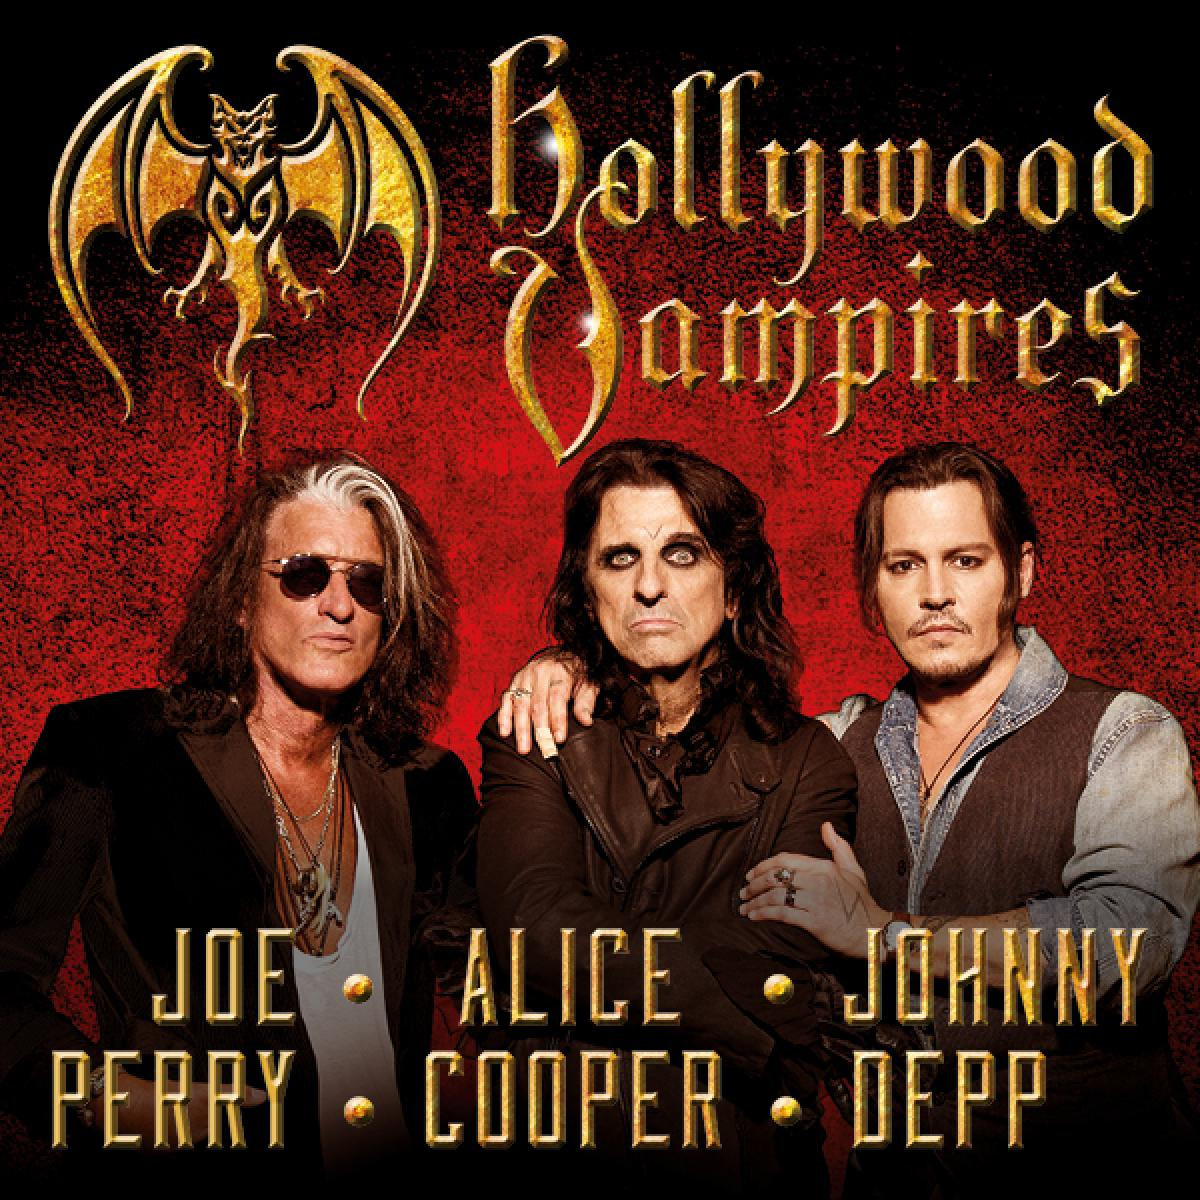 hollywood_vampires_banner_600x600px_01_0